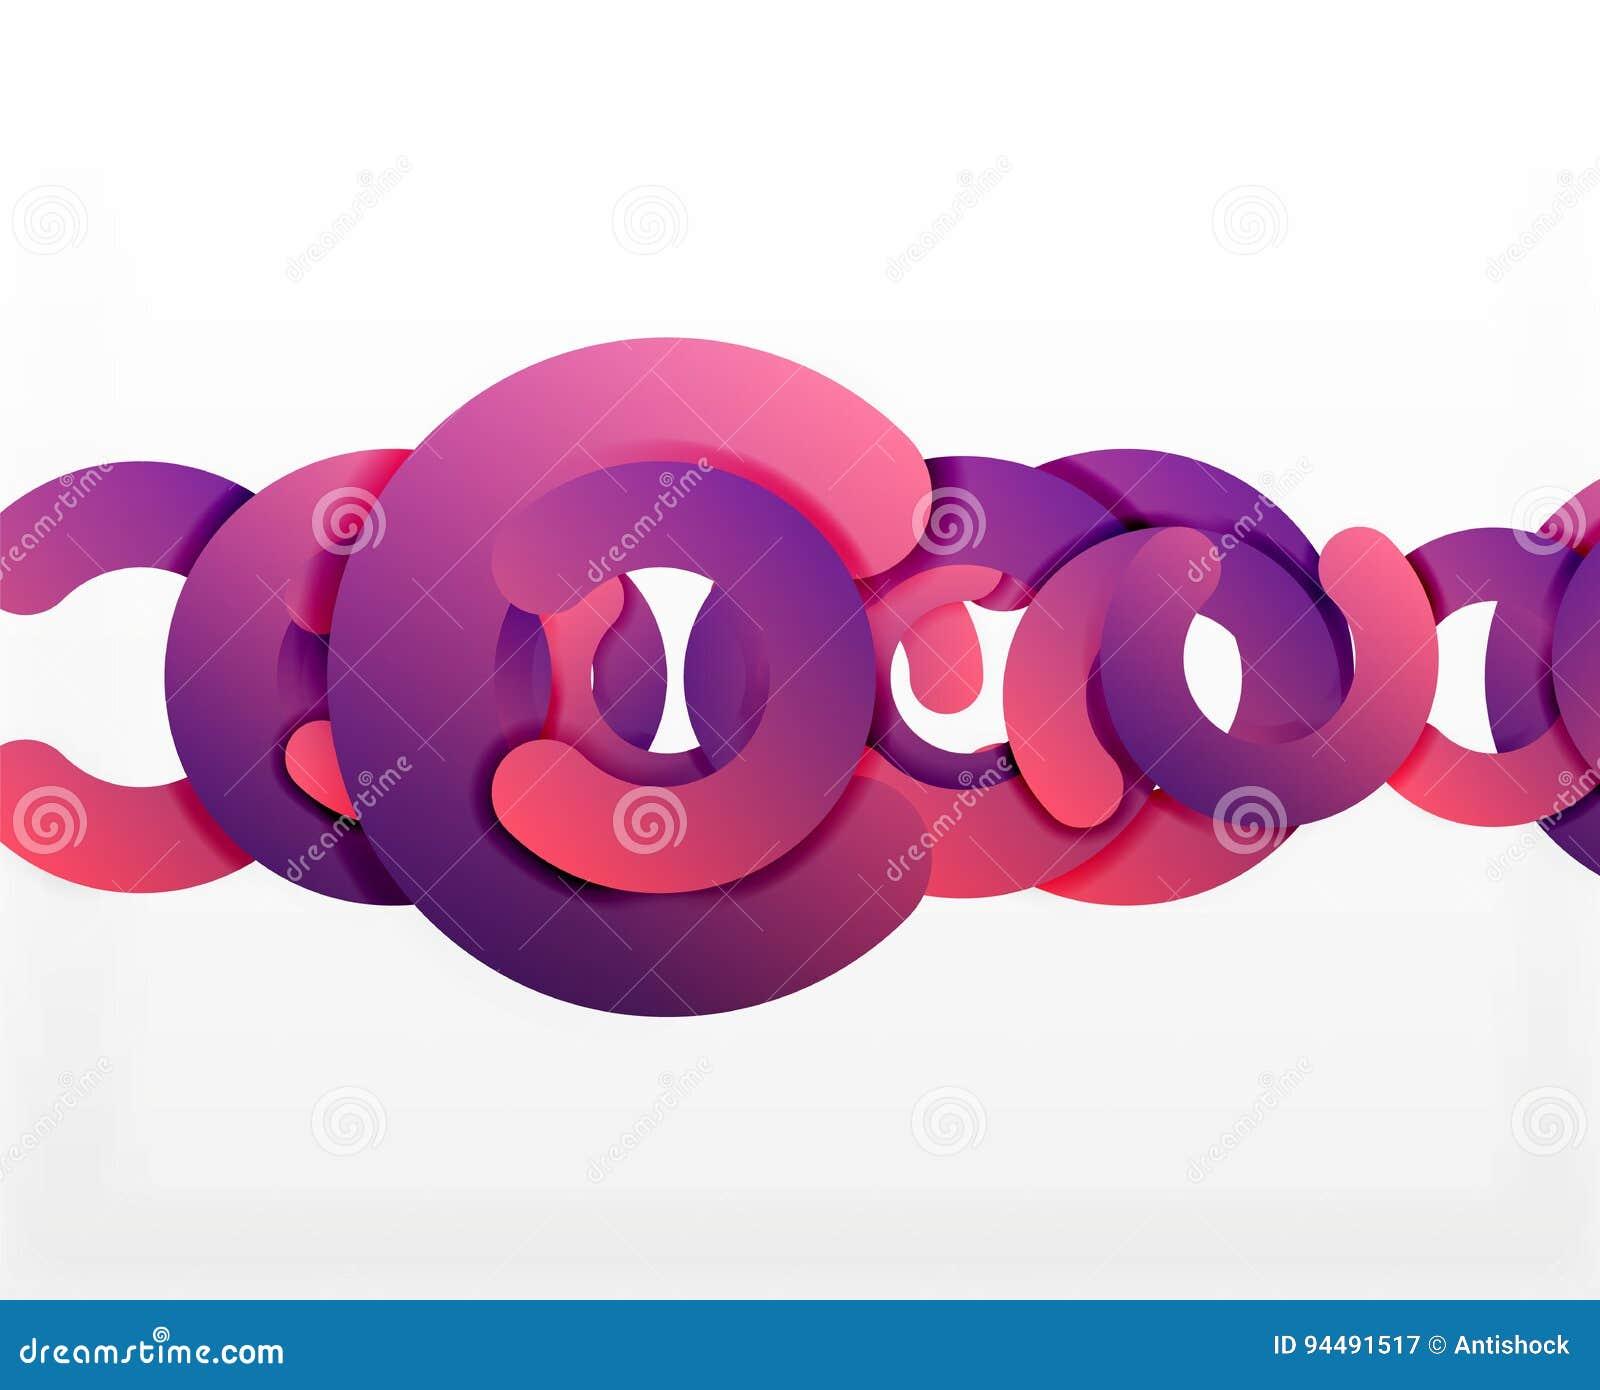 Fundo abstrato geométrico do círculo, negócio colorido ou projeto da tecnologia para a Web